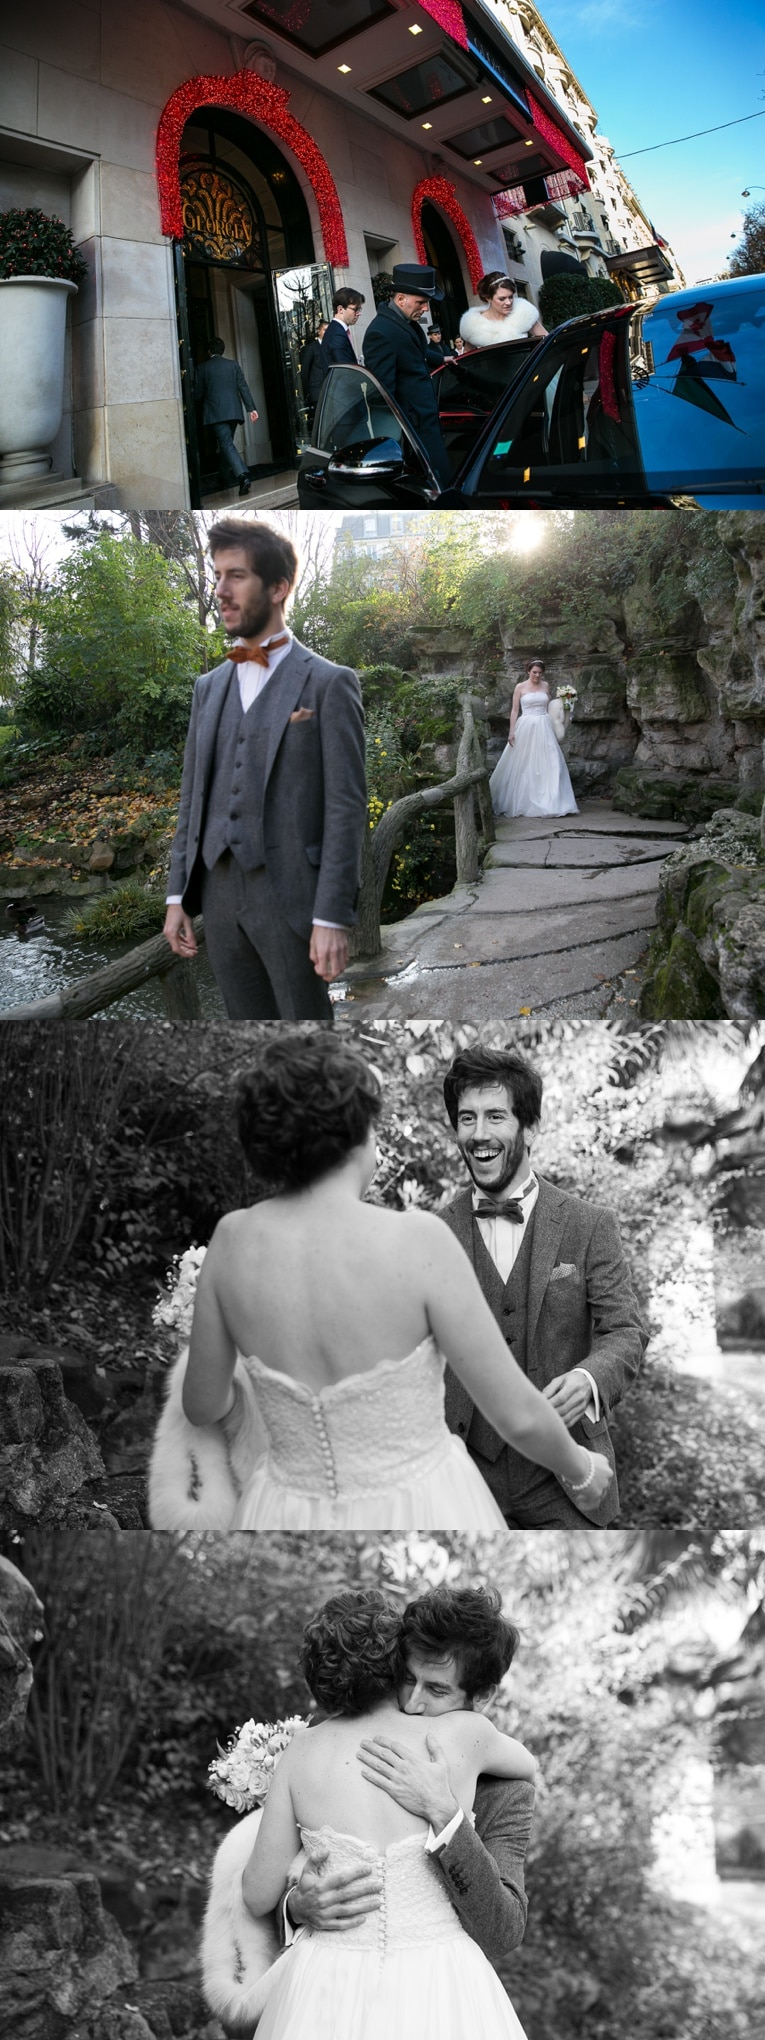 wedding-four-seasons-paris-04